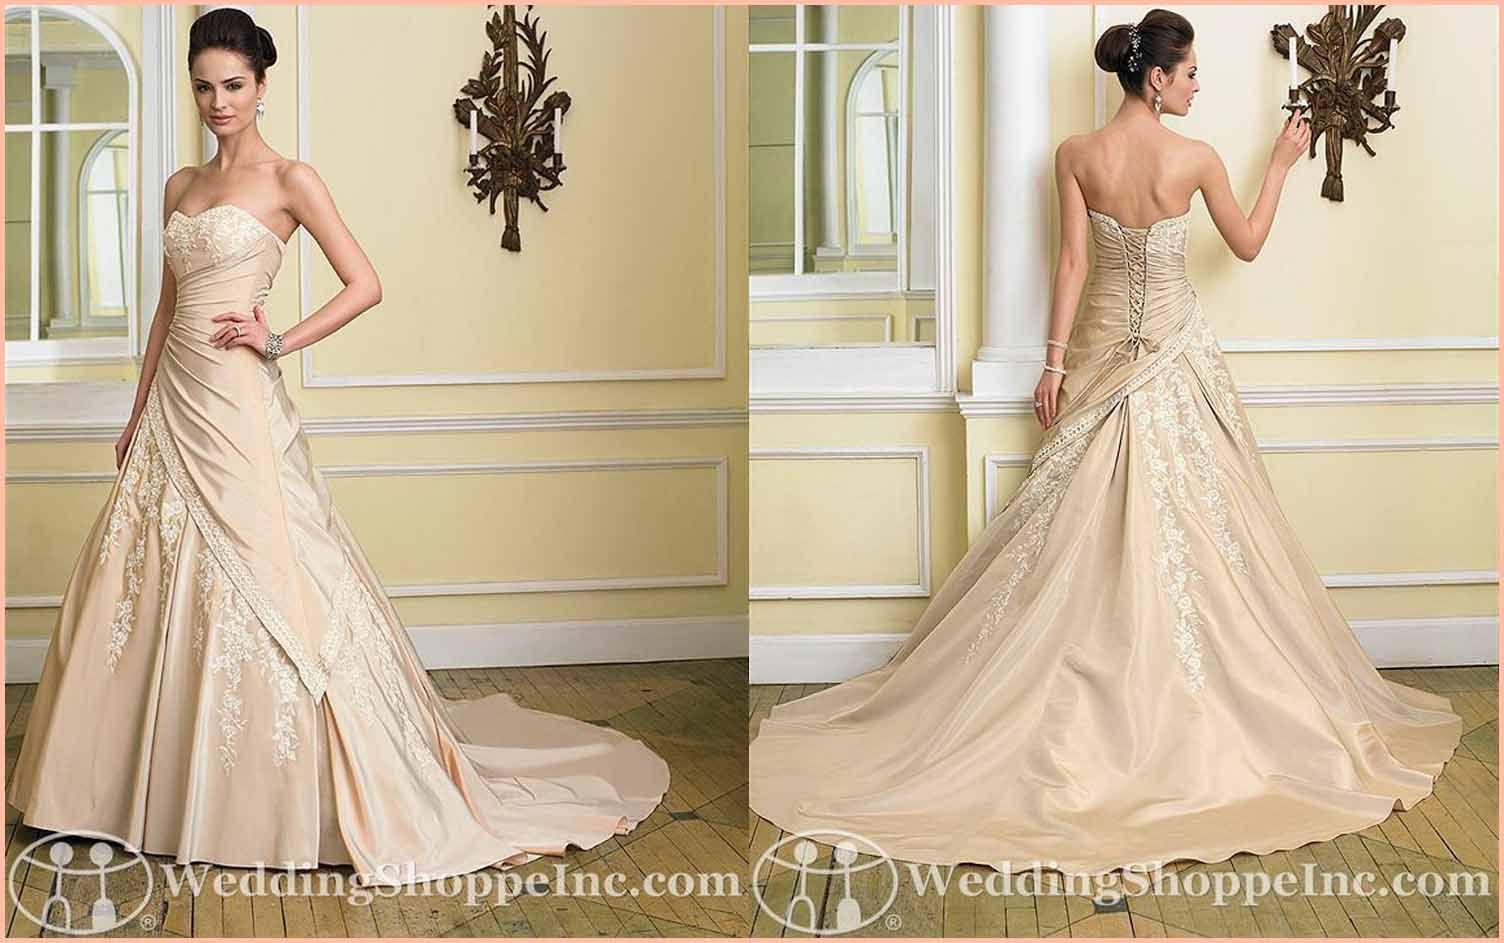 100+ Light Peach Wedding Dress Informal Wedding Dresses